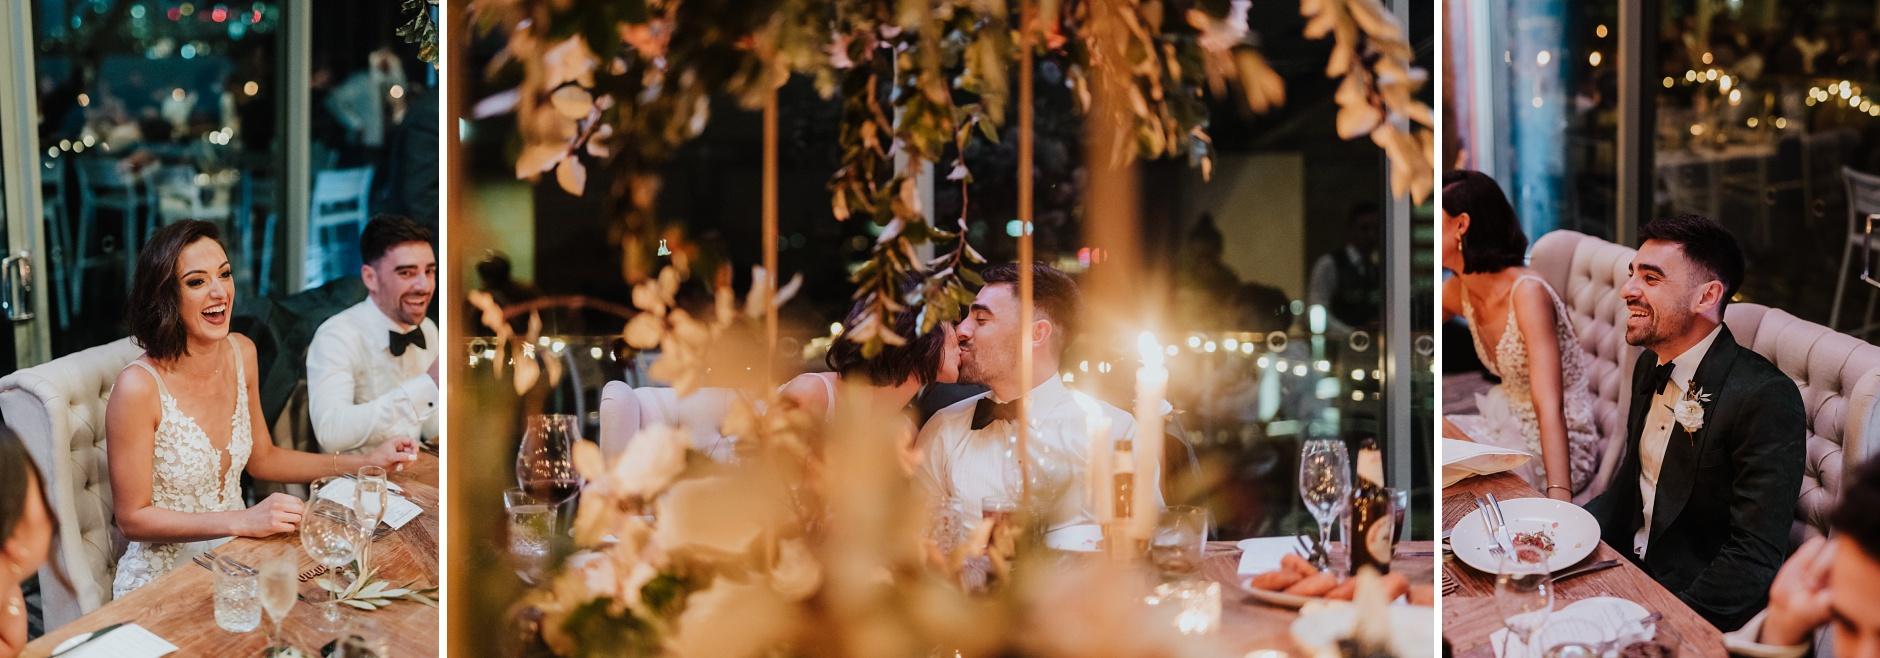 Sydney-Wedding-Photographer_0159.jpg